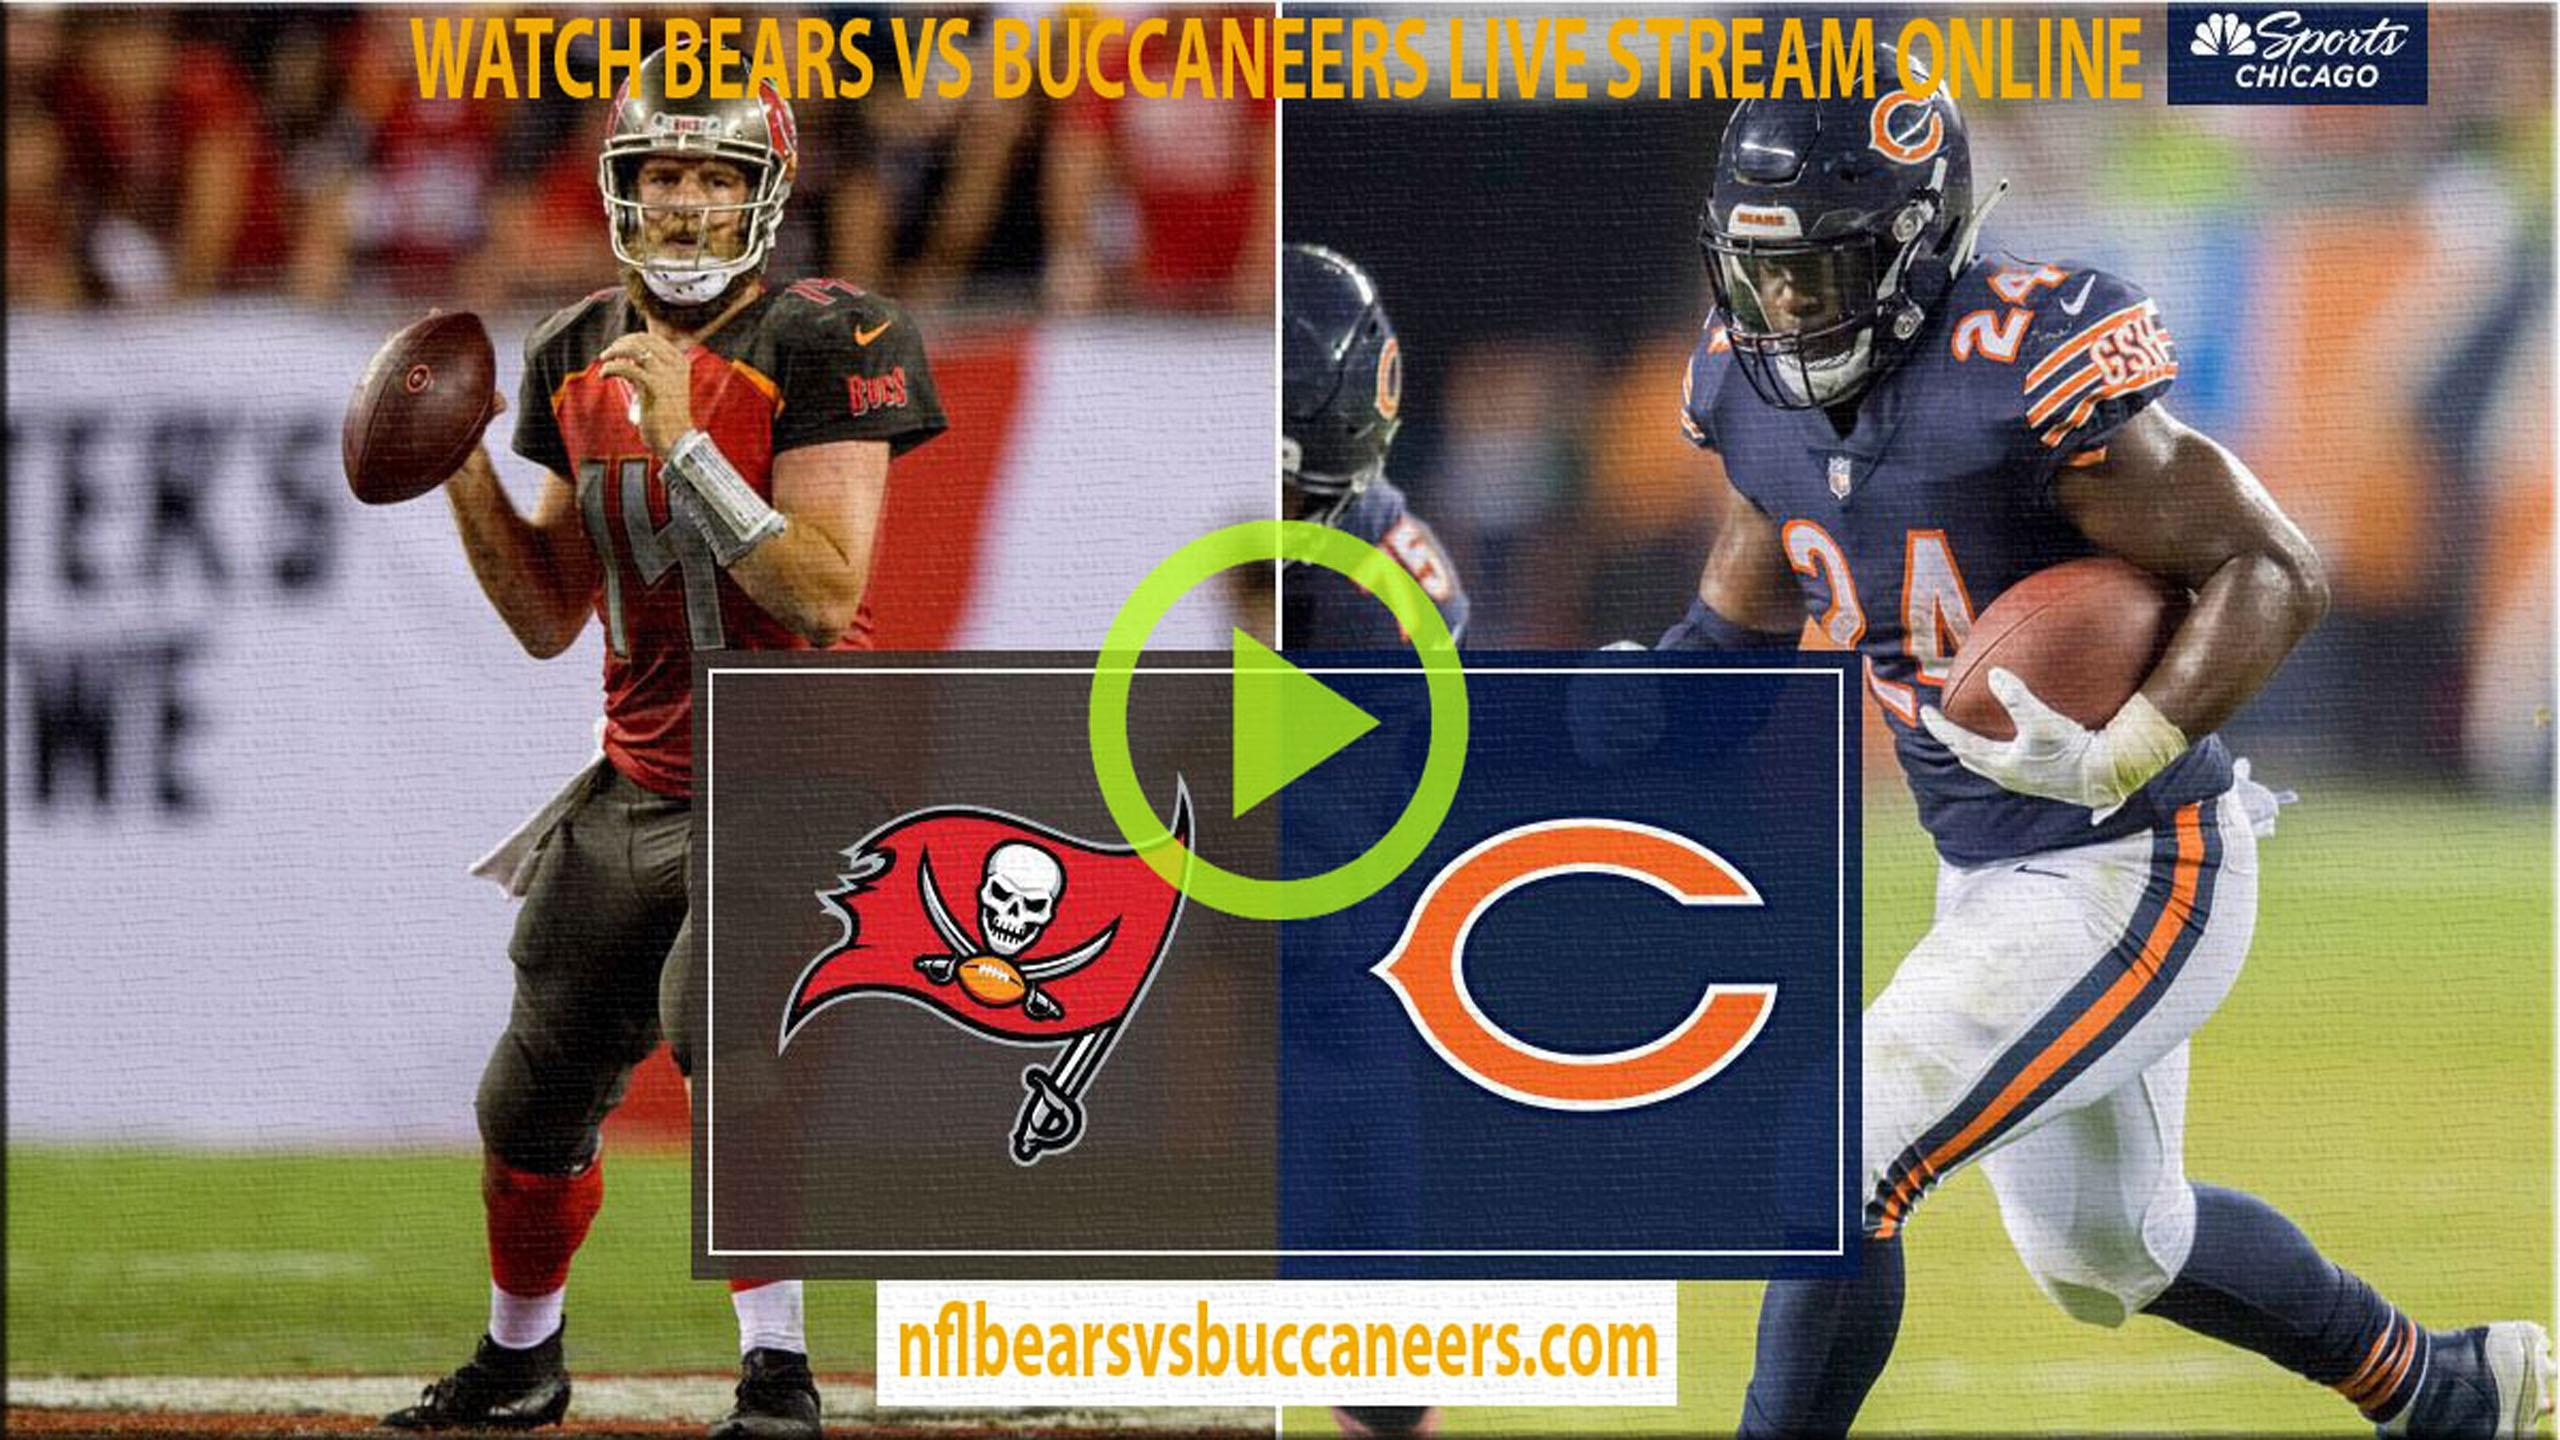 Bears vs Buccaneers Live (@bearsvsbuccaneers) Cover Image